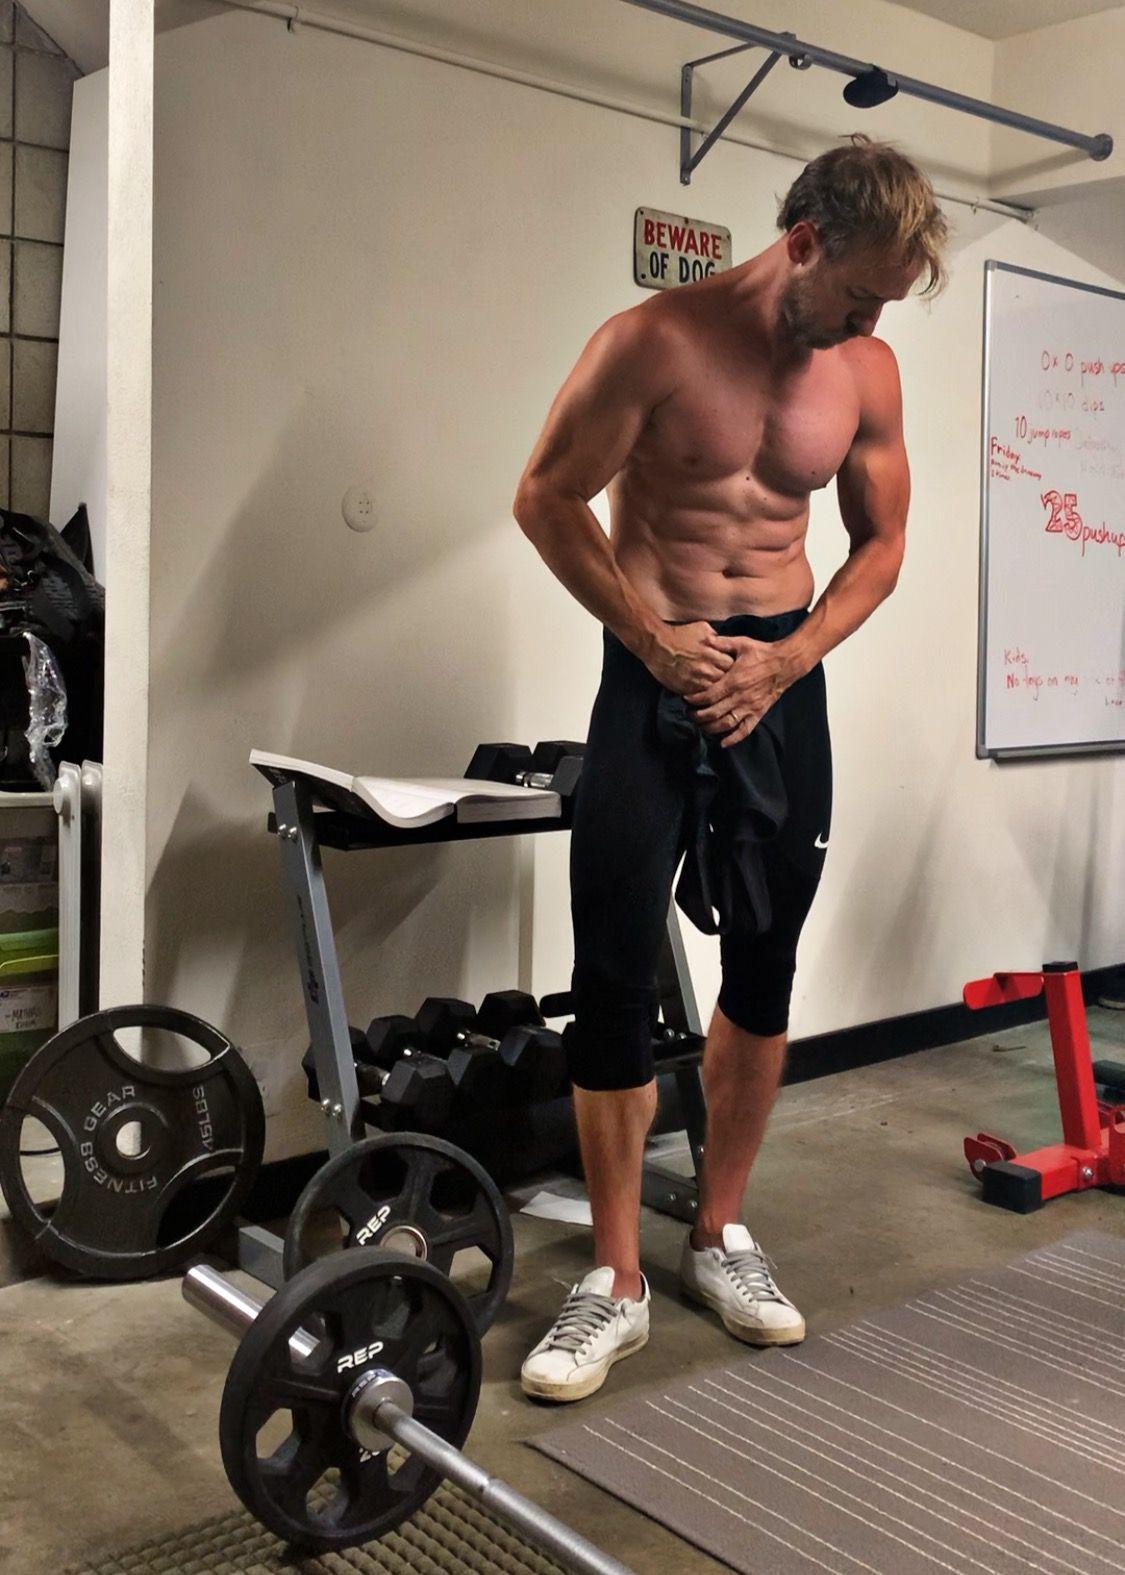 Gym Pump Pumps Workout Fitness